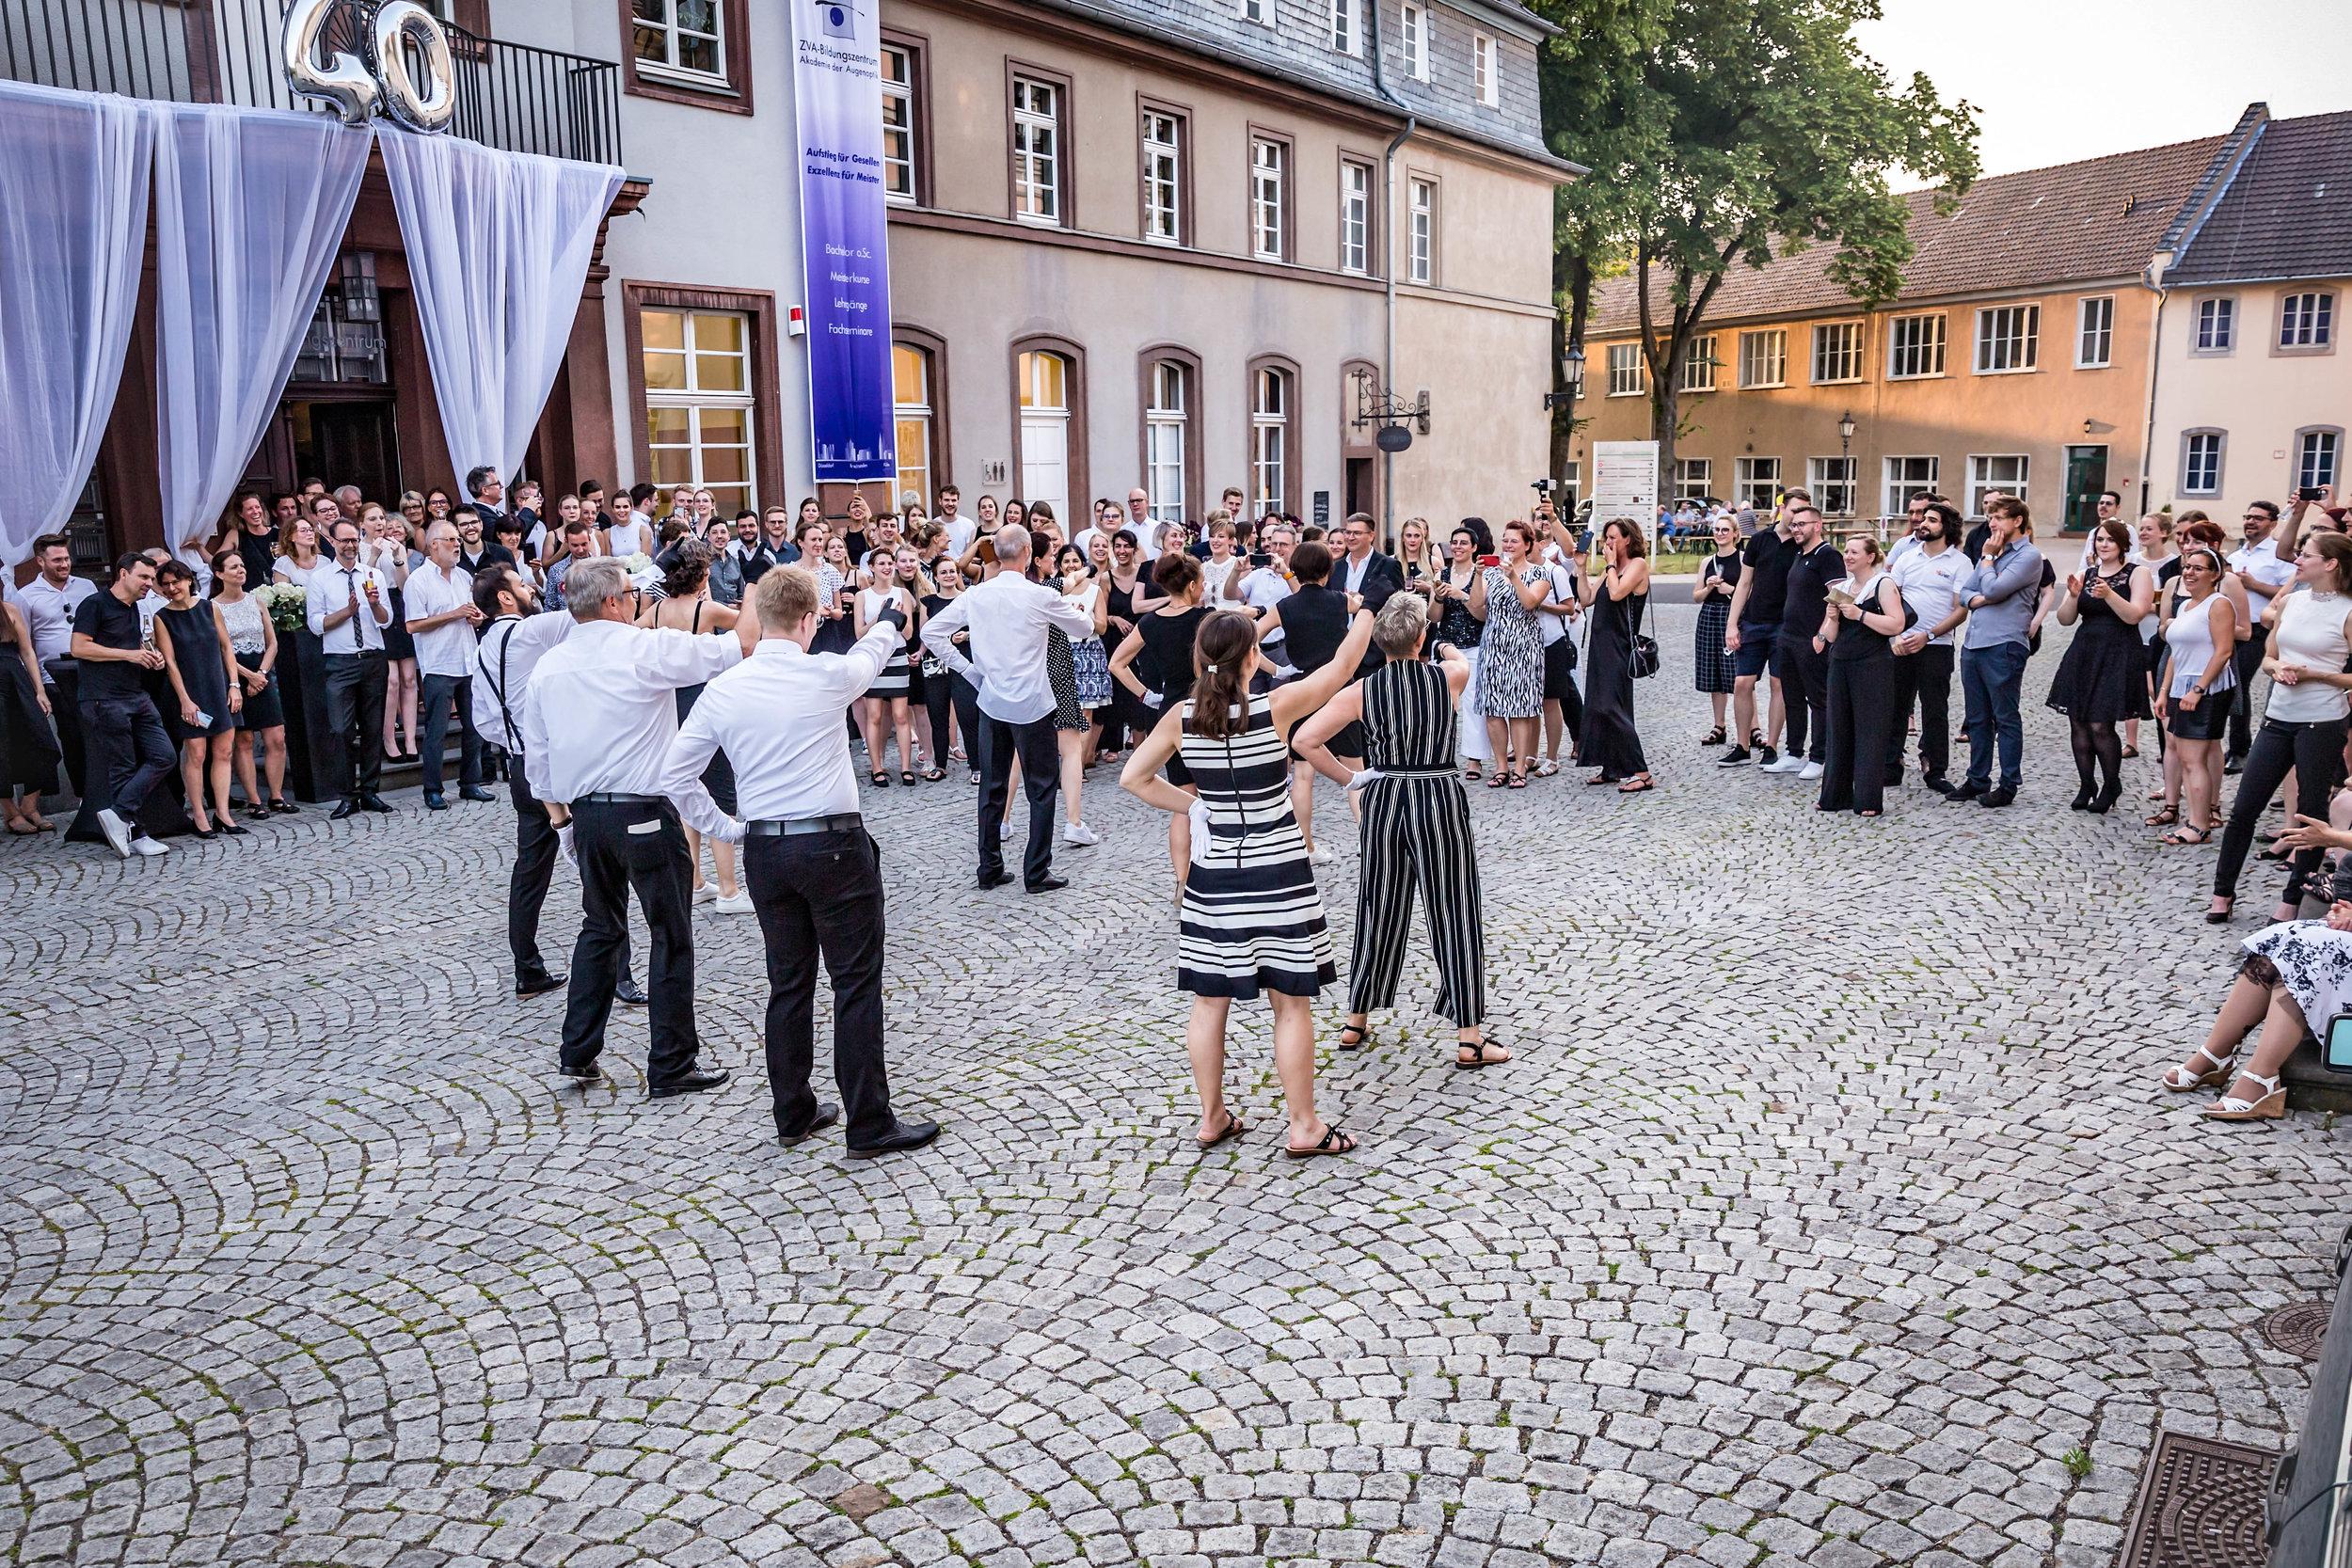 20190626_Akademie_40-jähriges_Jubiläum_kl-5311982.jpg